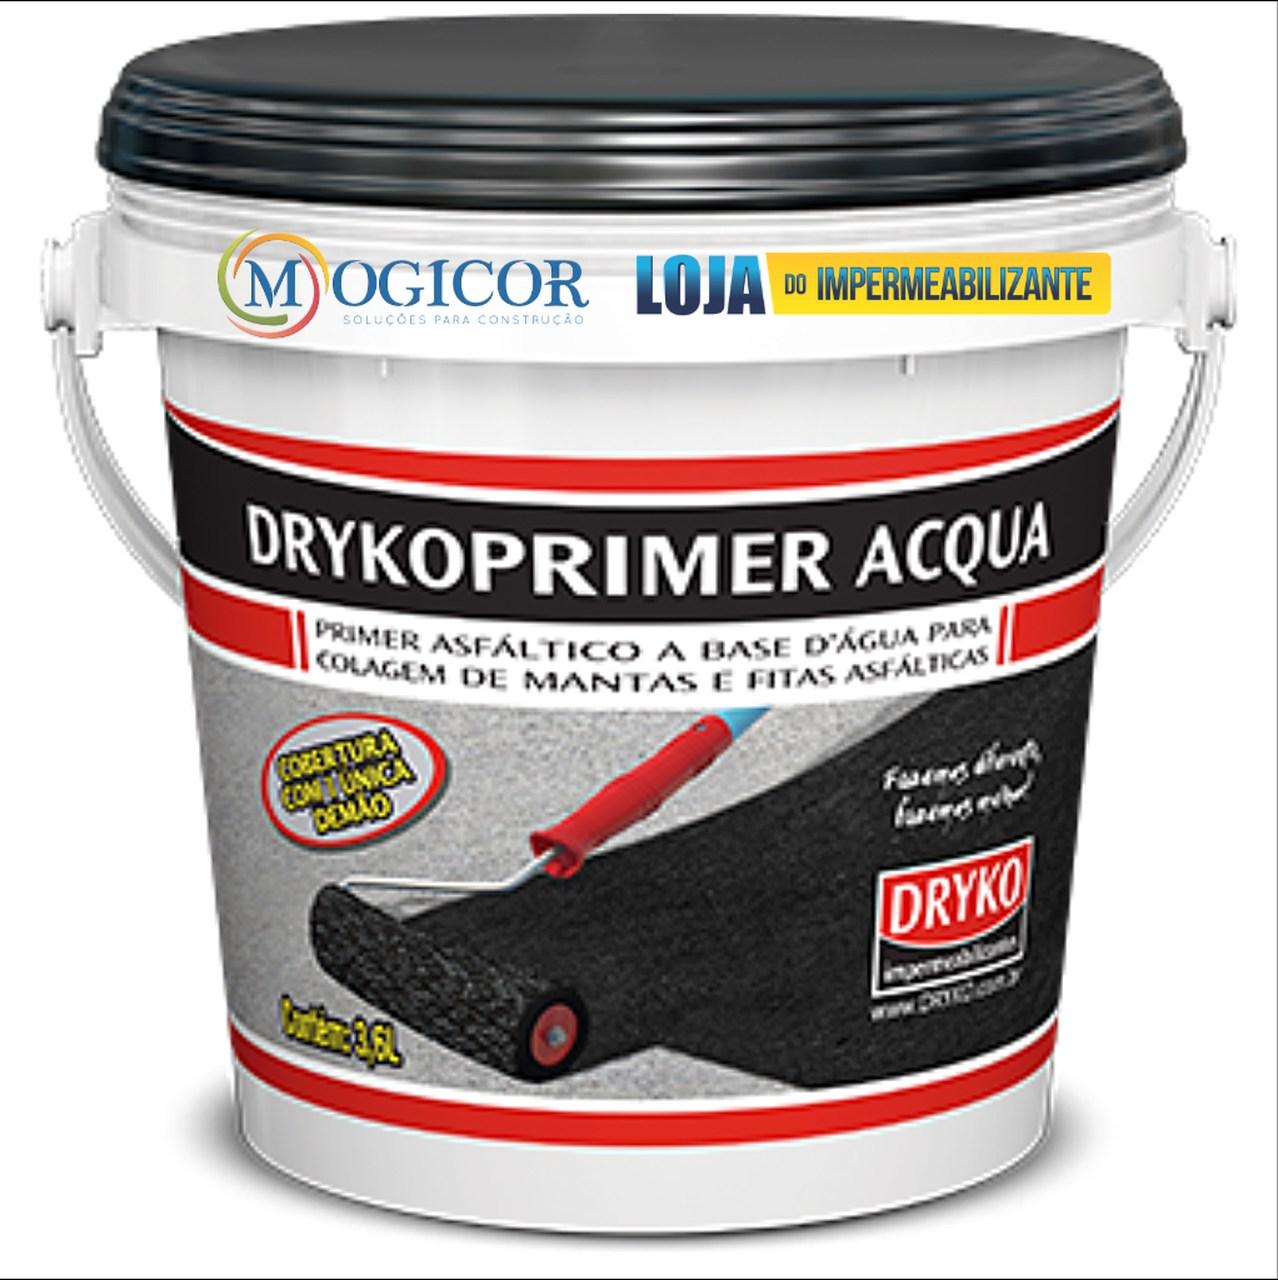 Primer P/ Manta Asfáltica Drykoprimer Acqua 3,6L